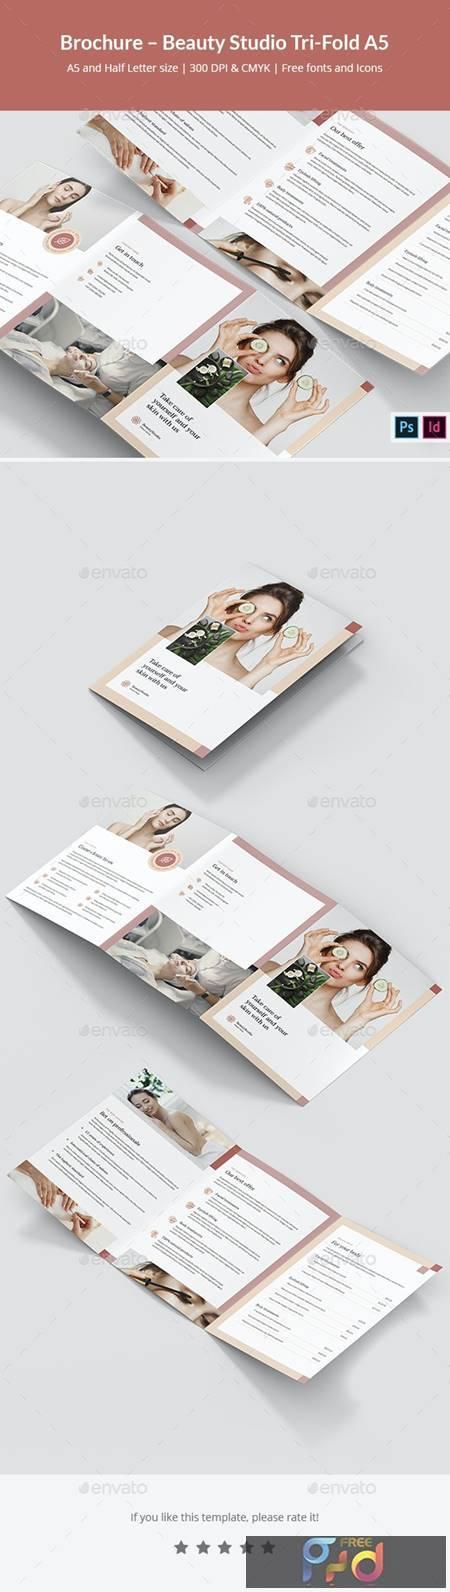 Brochure - Beauty Studio Tri-Fold A5 30890660 1